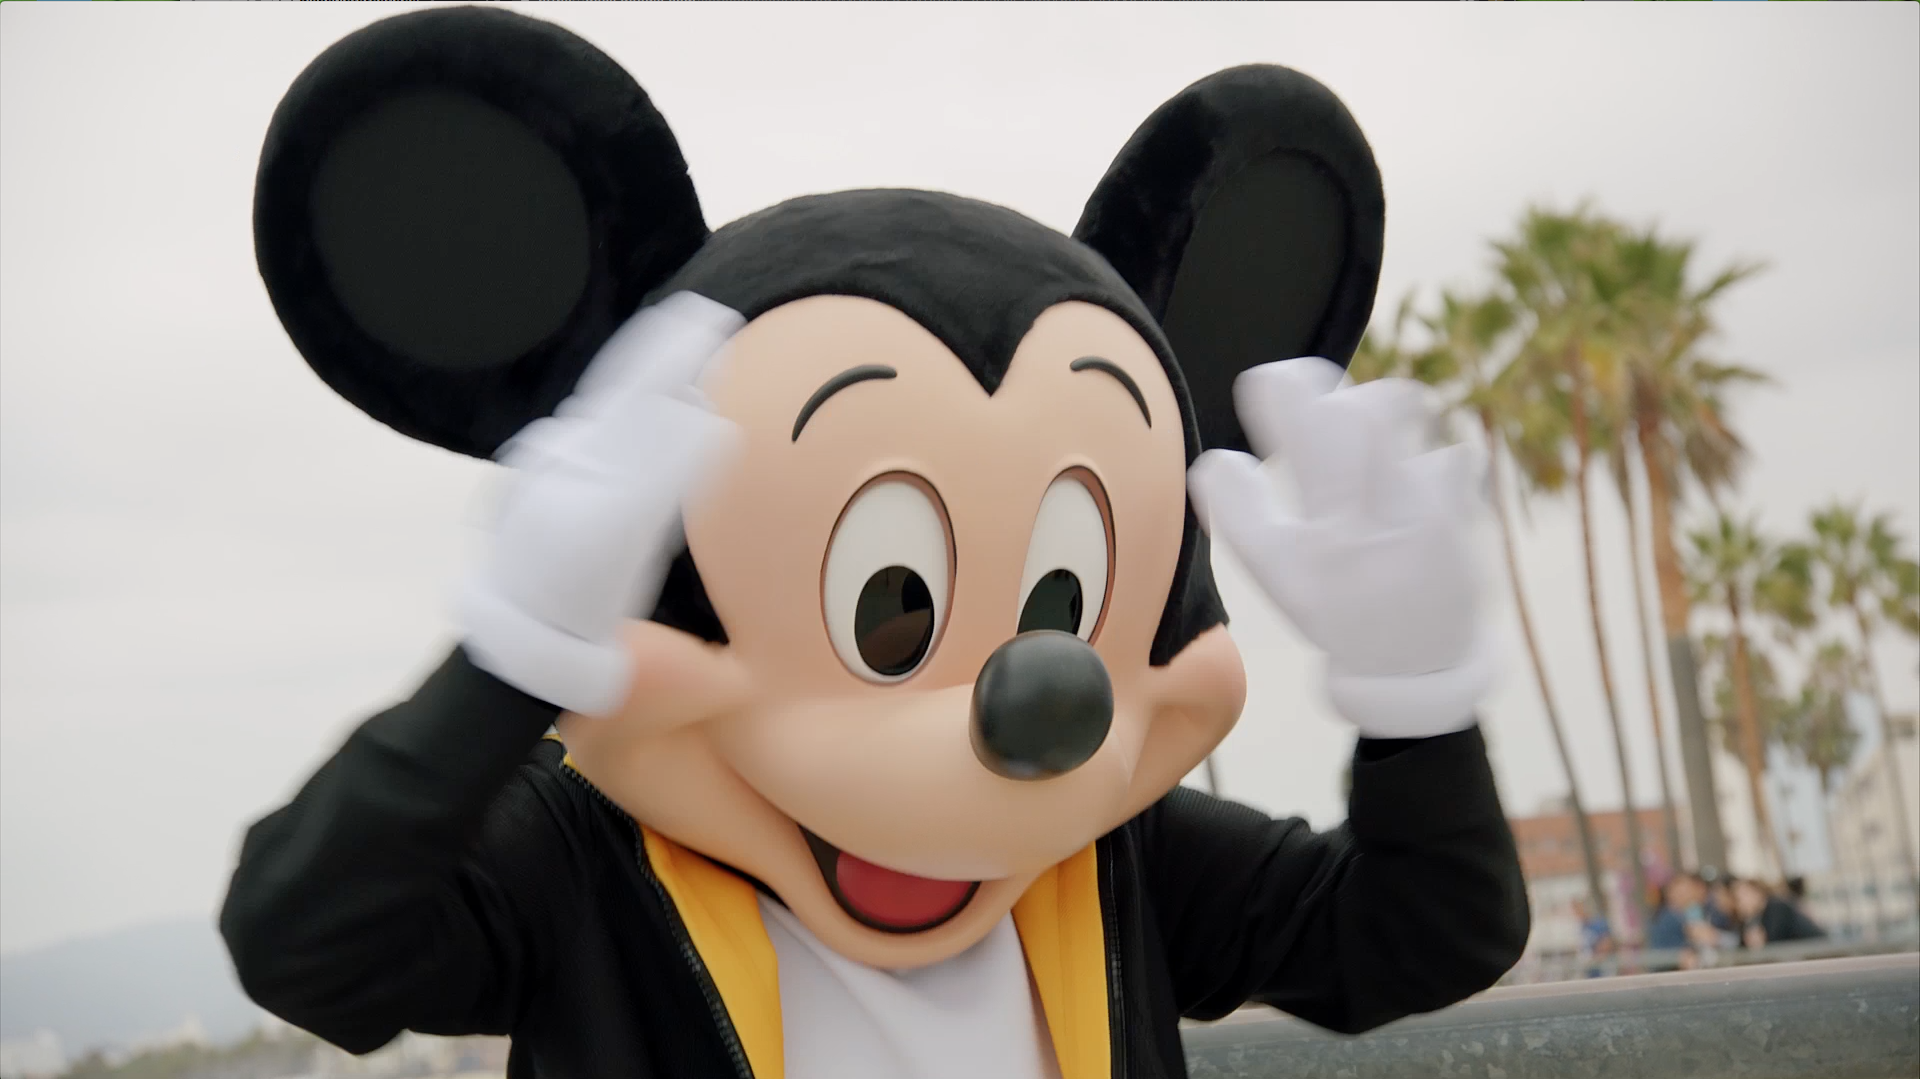 ¡Feliz cumpleaños, Mickey!